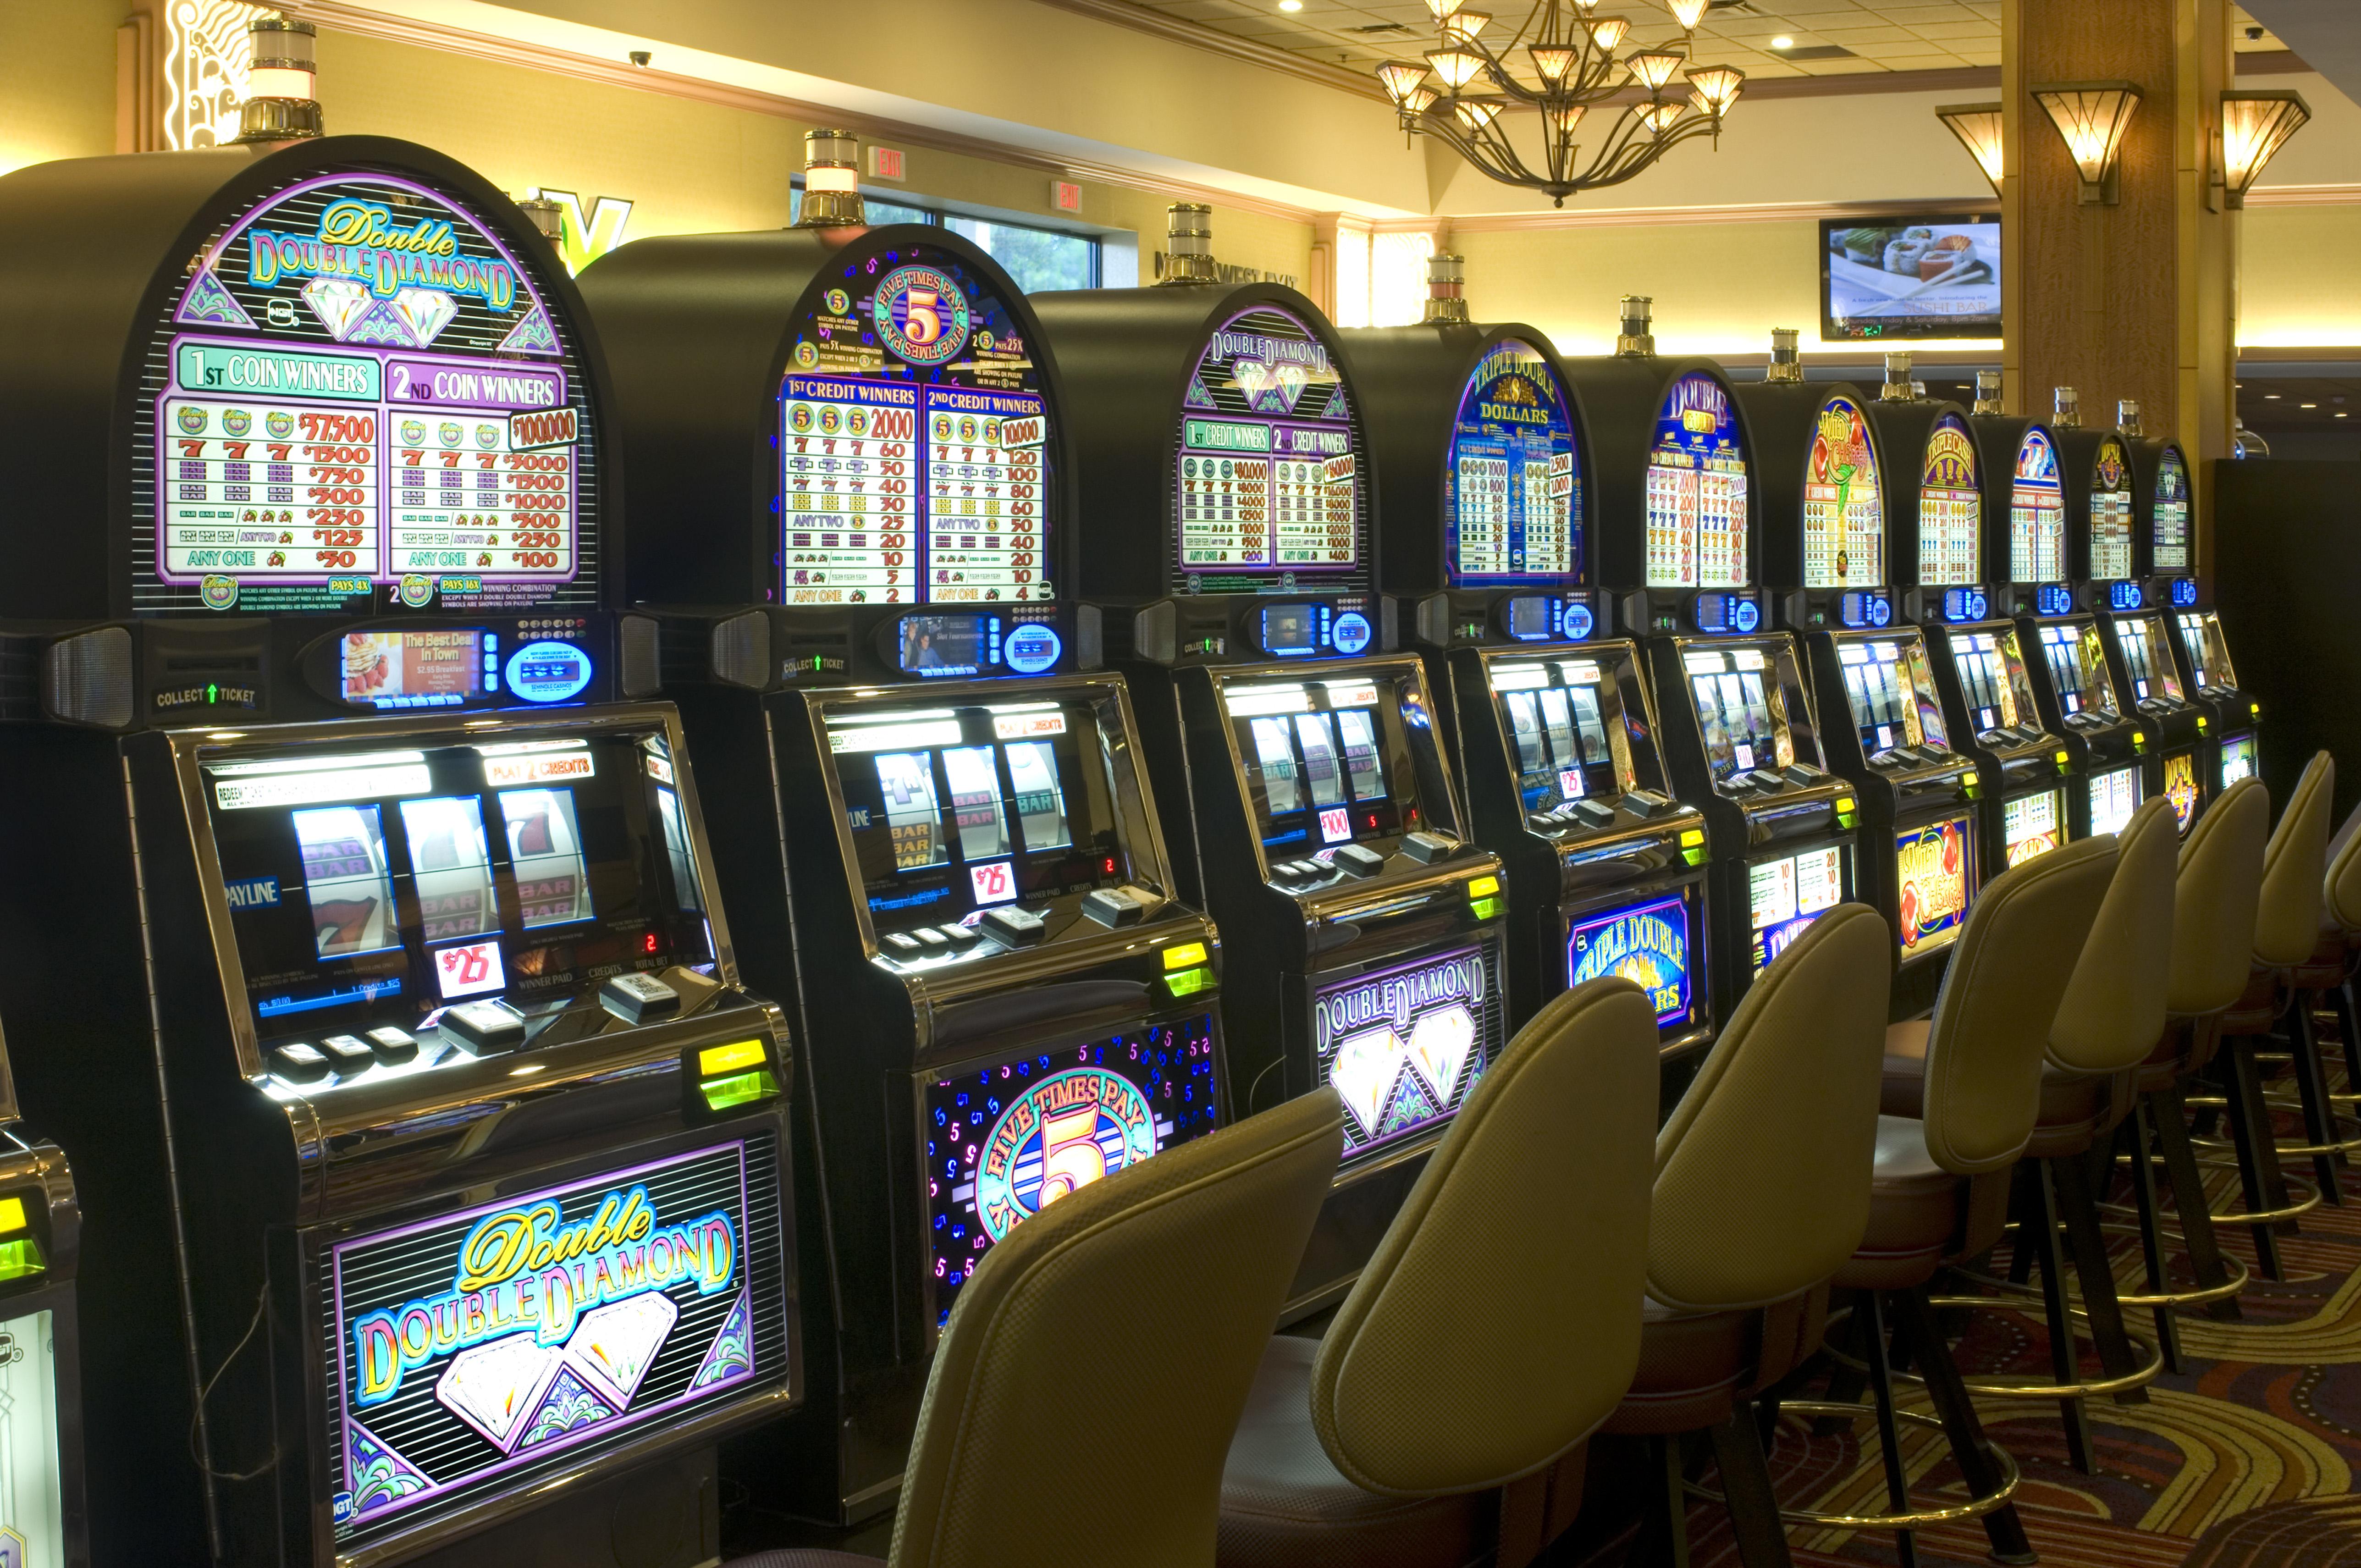 Casino denies jackpot casino in naples italy